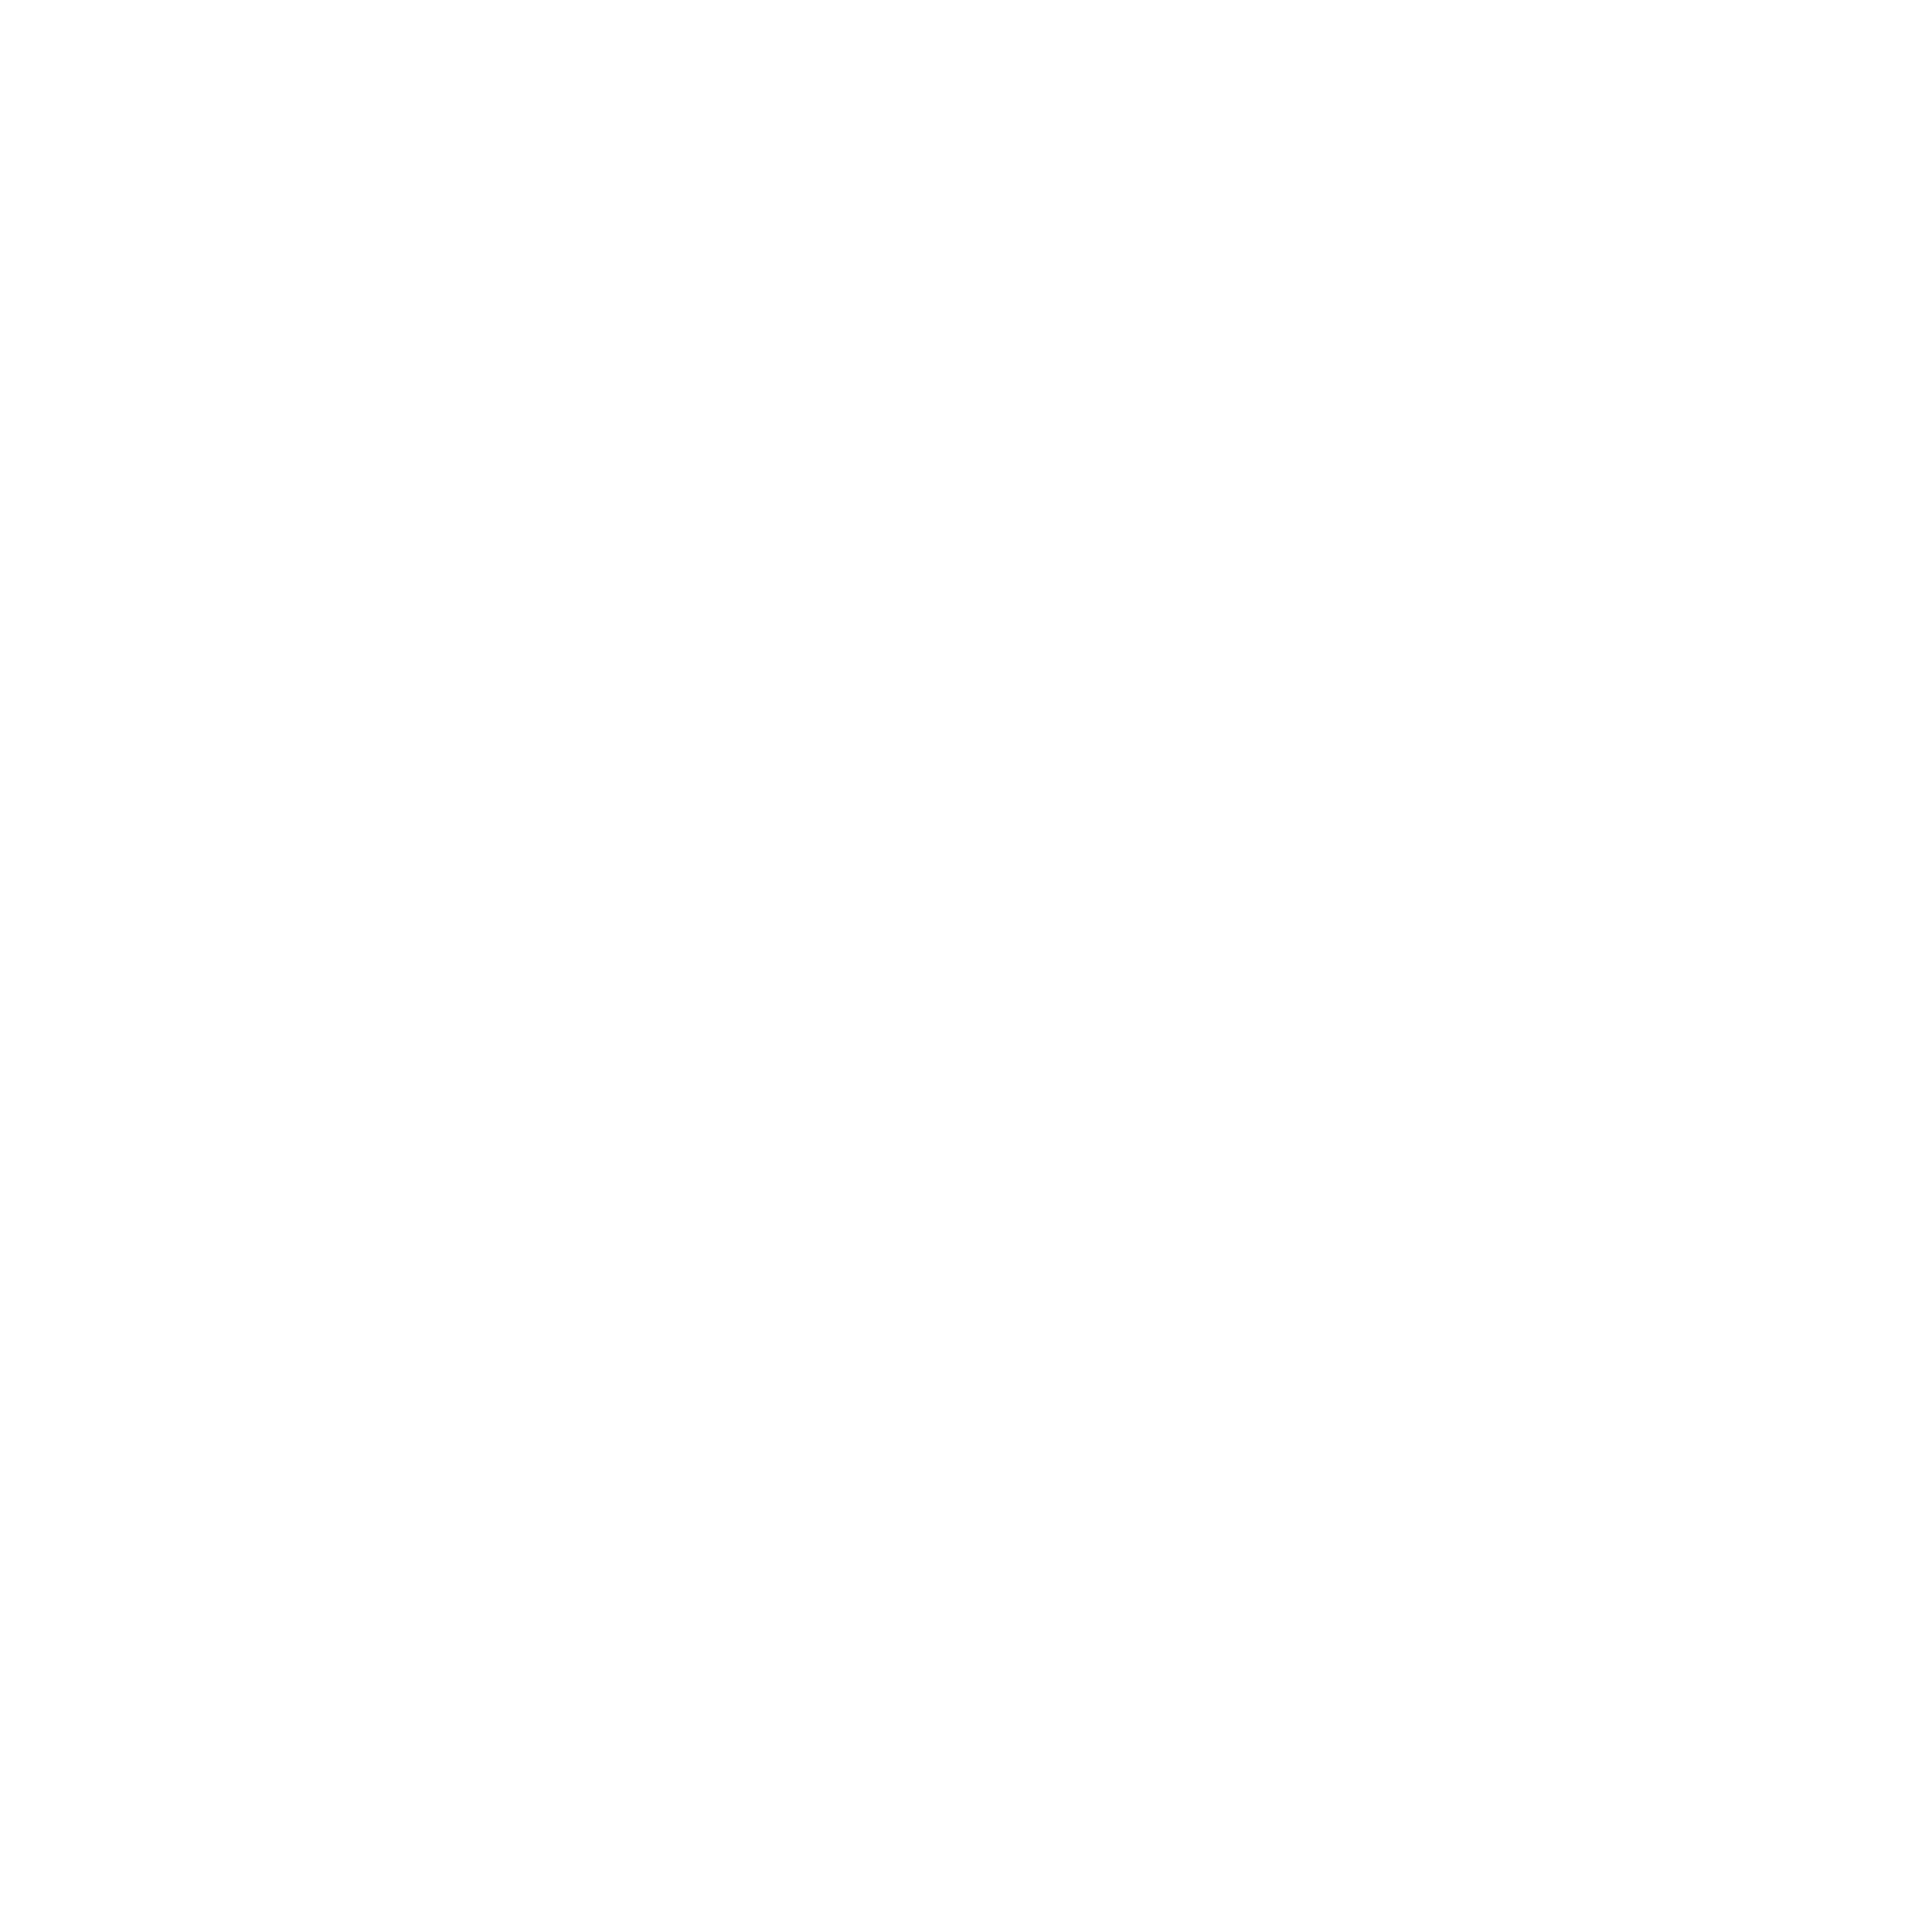 Disney Store Logo PNG Transparent & SVG Vector.